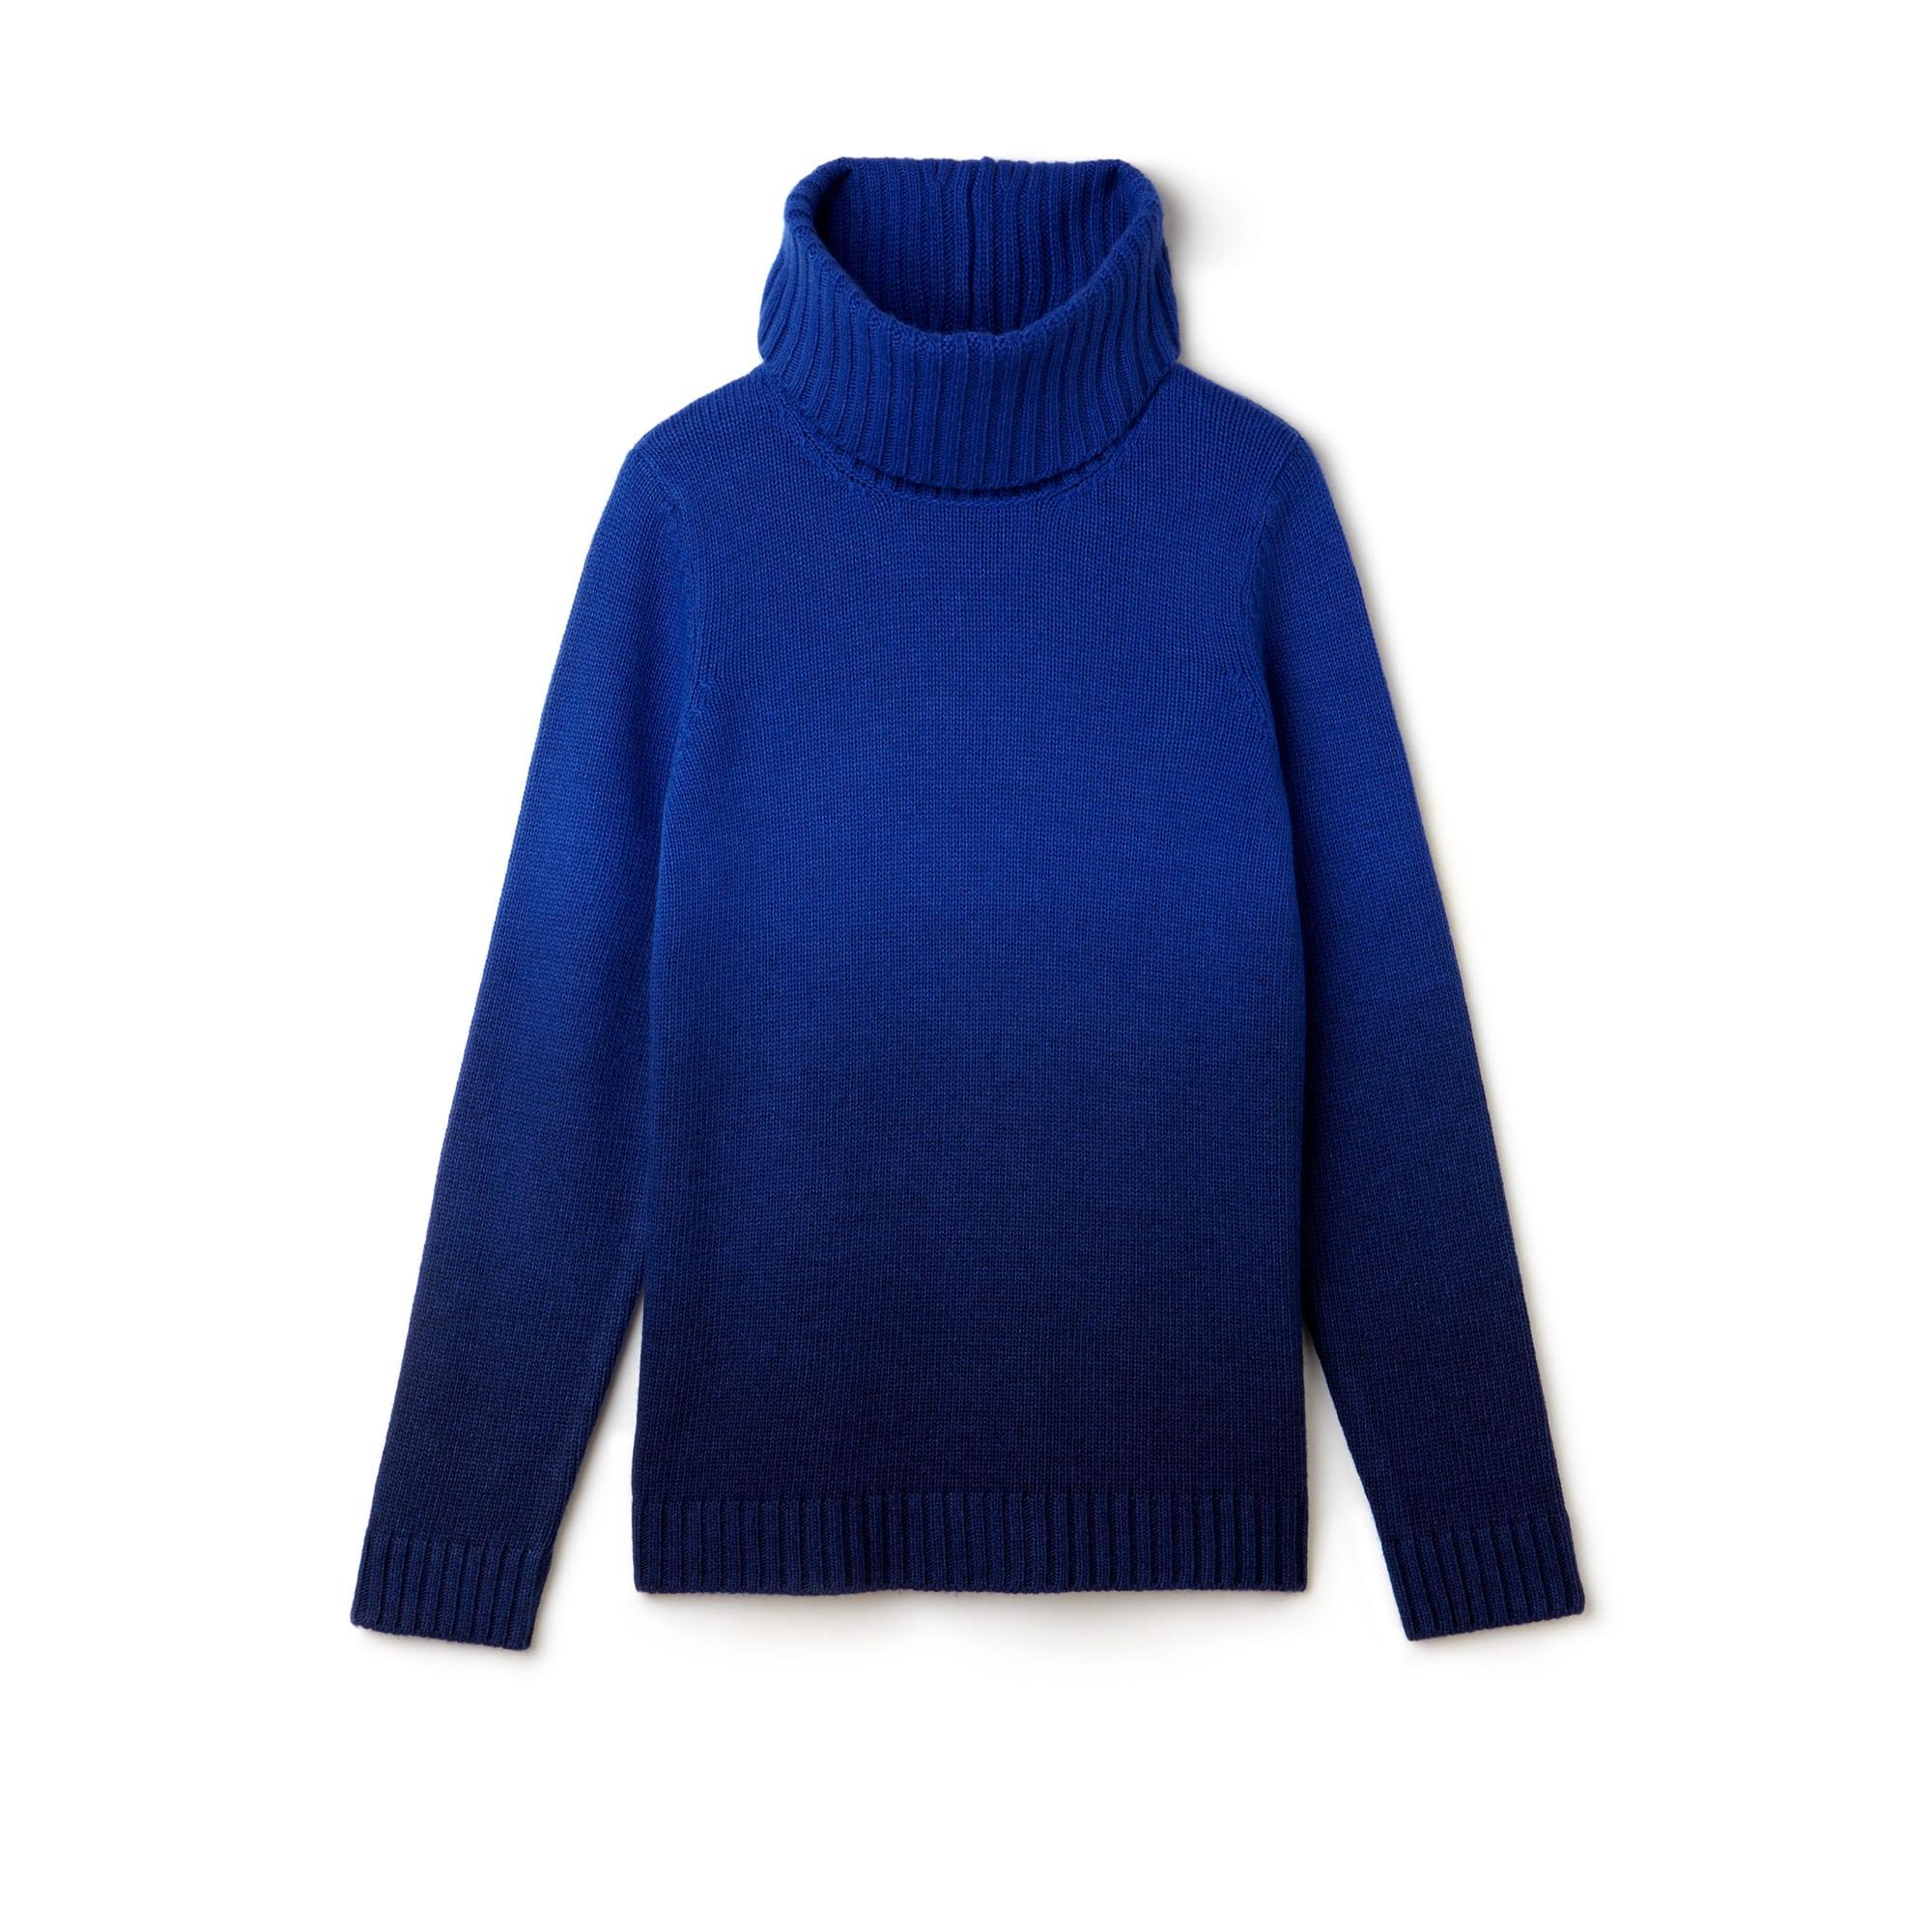 Women's Wool Jersey Dip Dyed Turtleneck Sweater